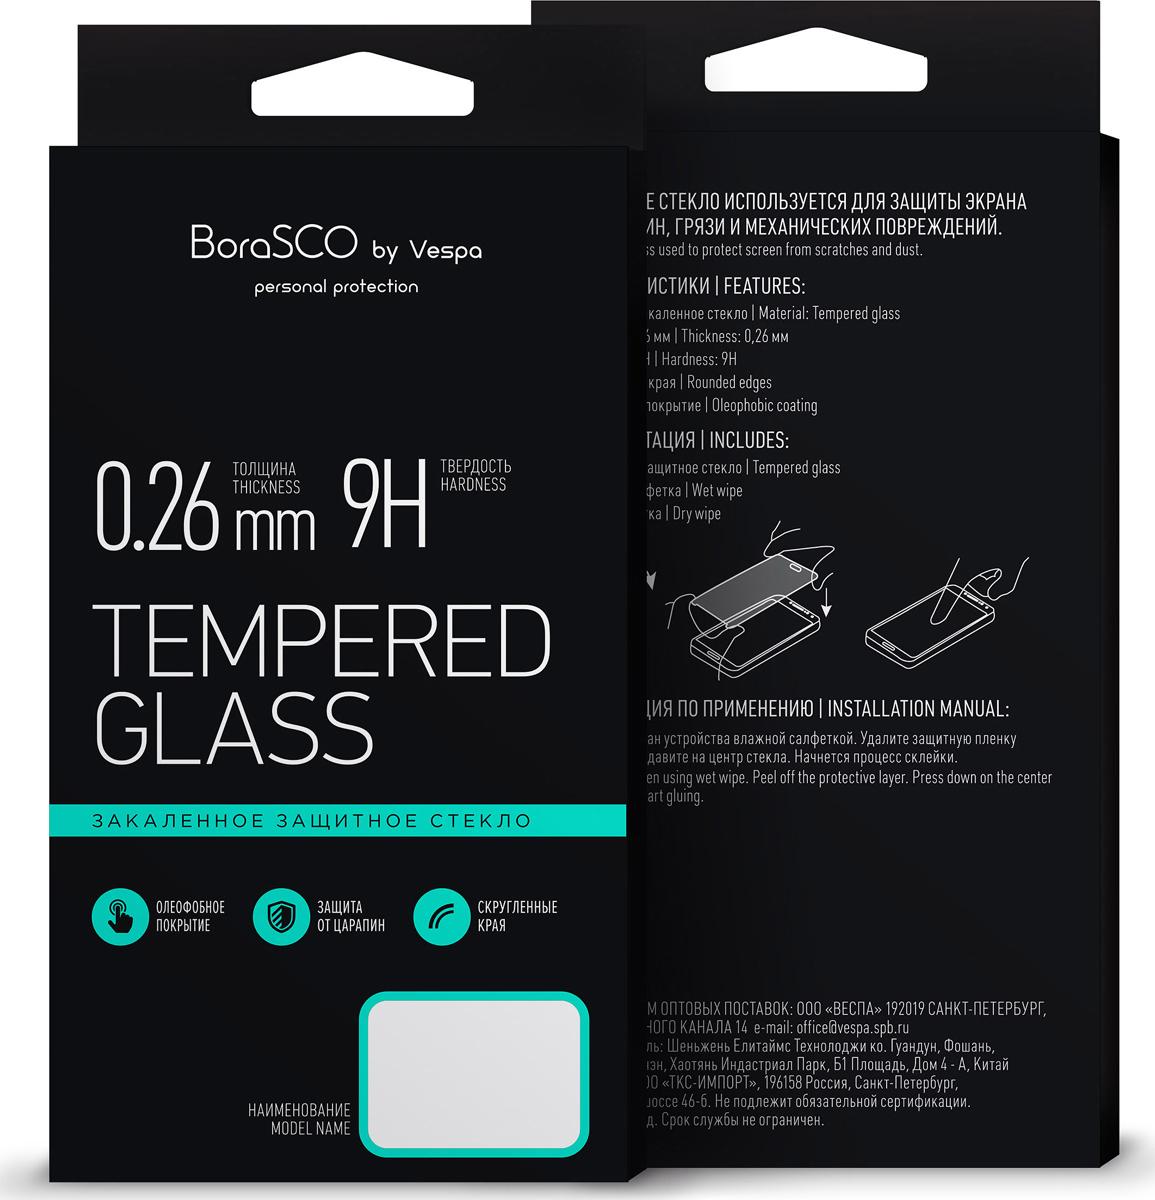 Защитное стекло BoraSCO by Vespa Full Cover + Full Glue для Xiaomi Mi 9 T (K20)/ Mi 9 T Pro (K20 Pro), прозрачный, черный